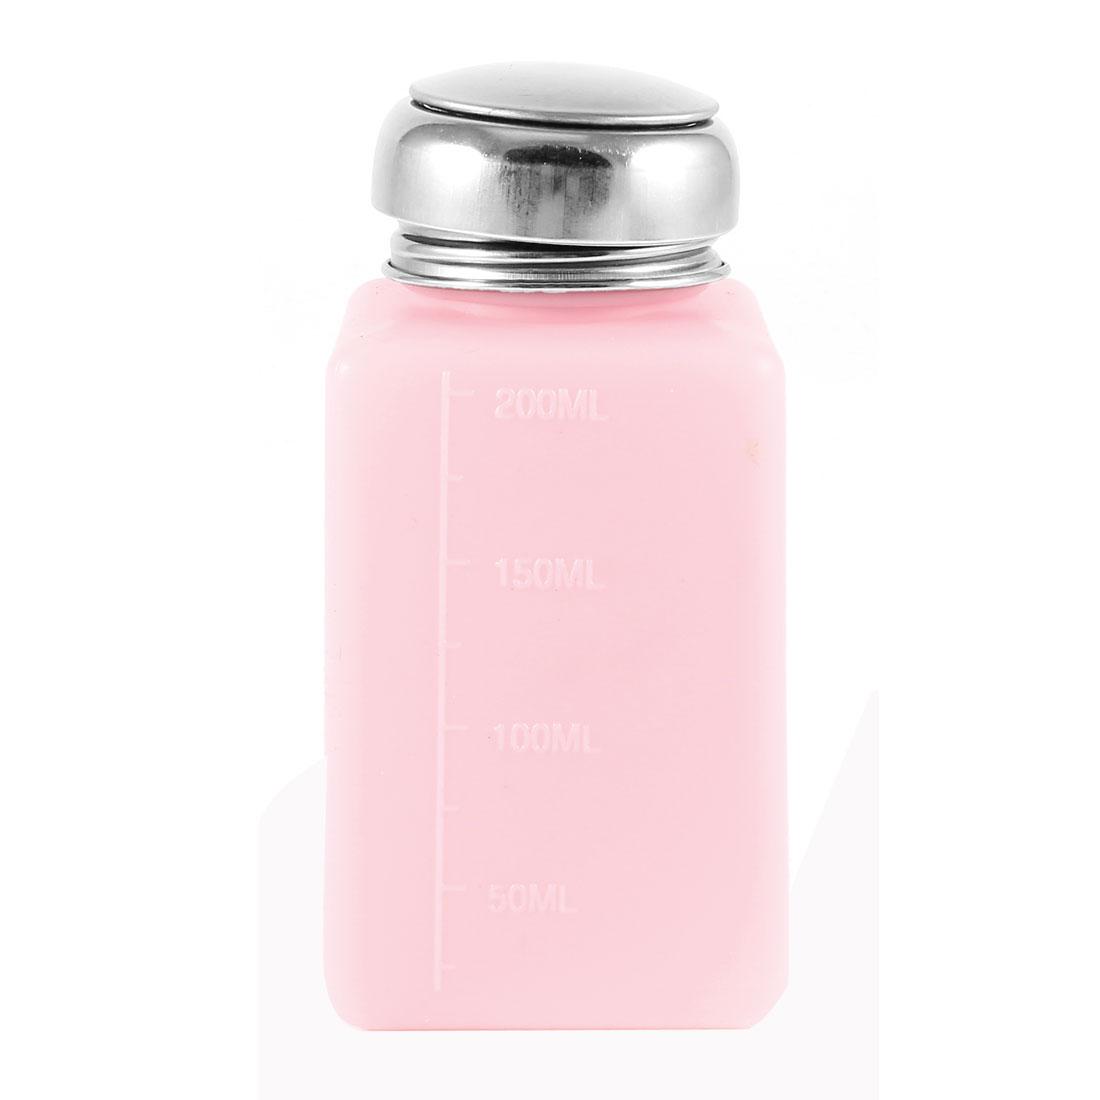 Silver Tone Metal Lid 200ml Plastic Liquid Storage Alcohol Bottle Pink